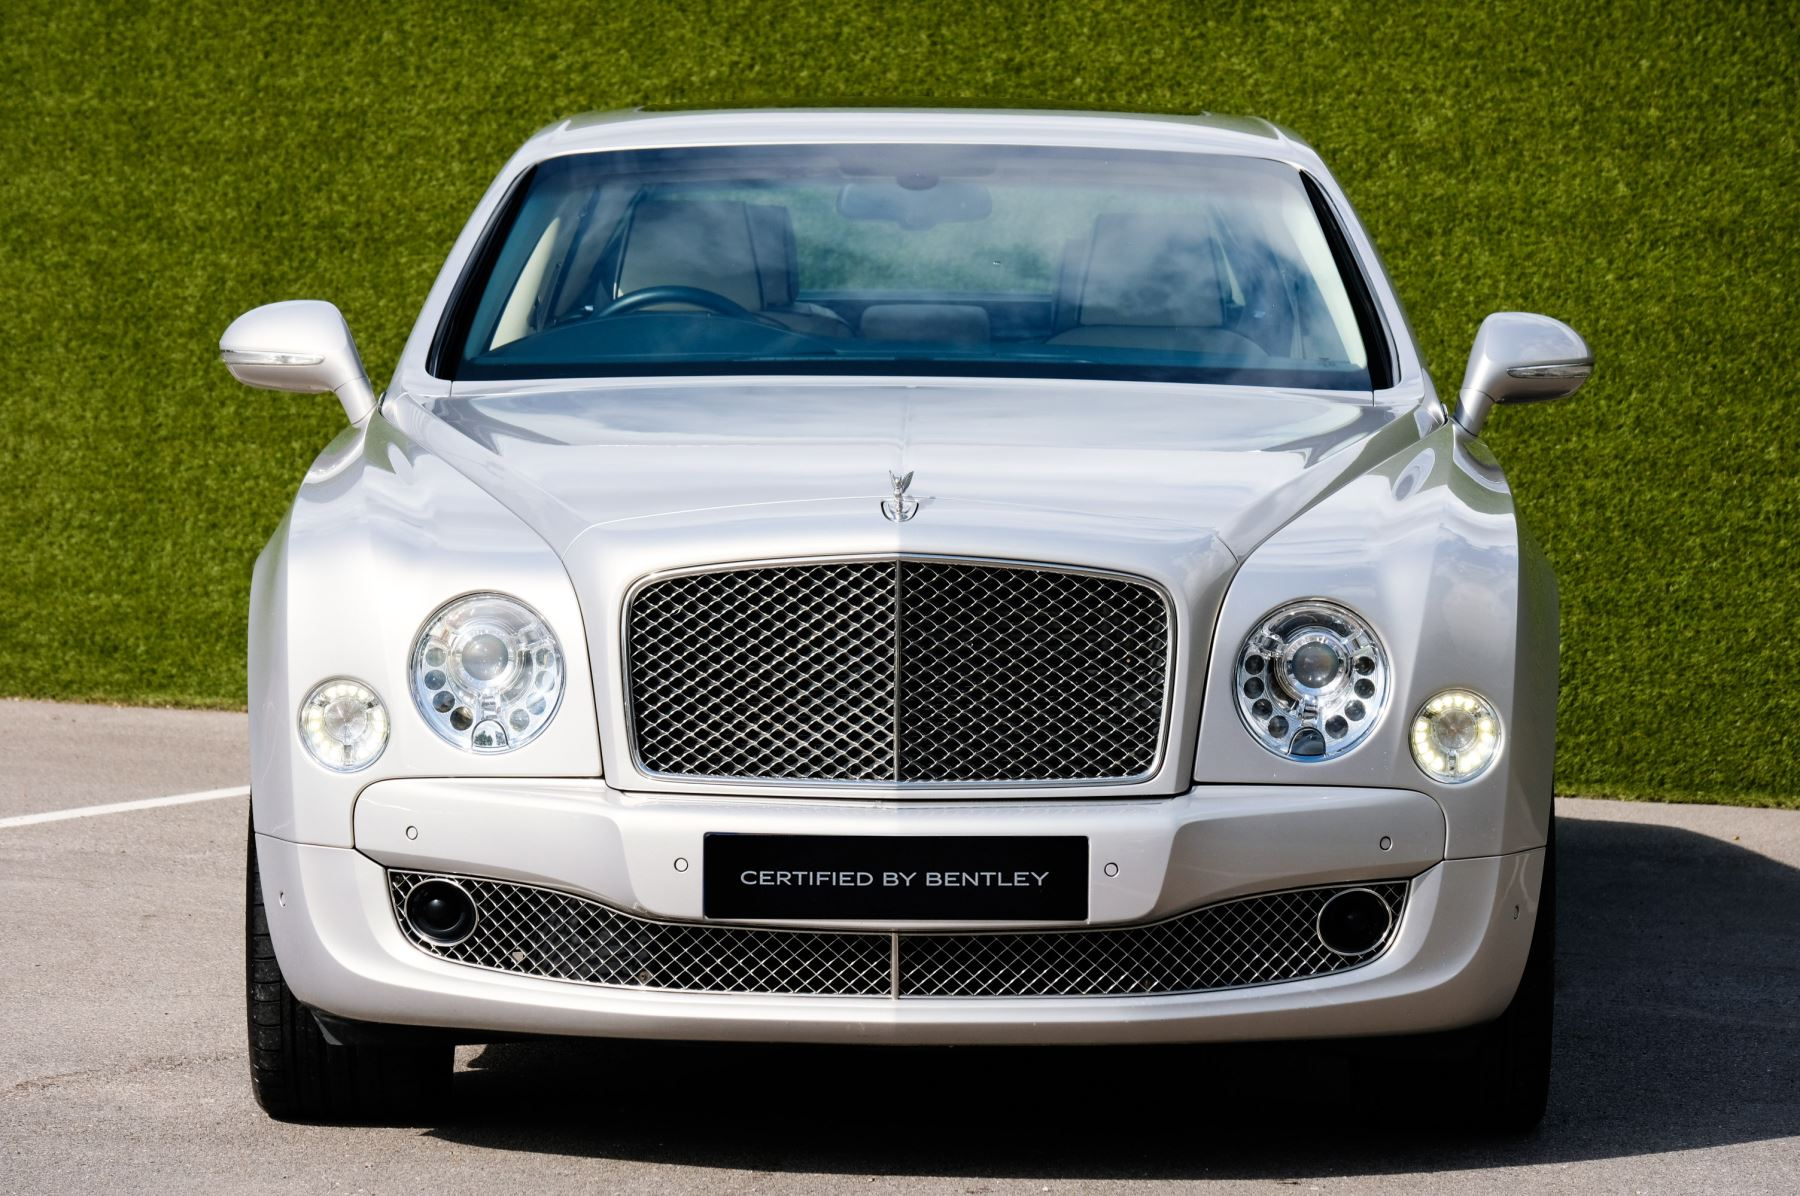 Bentley Mulsanne 6.8 V8 Mulliner Driving Spec - Naim For Bentley Premium Audio image 2